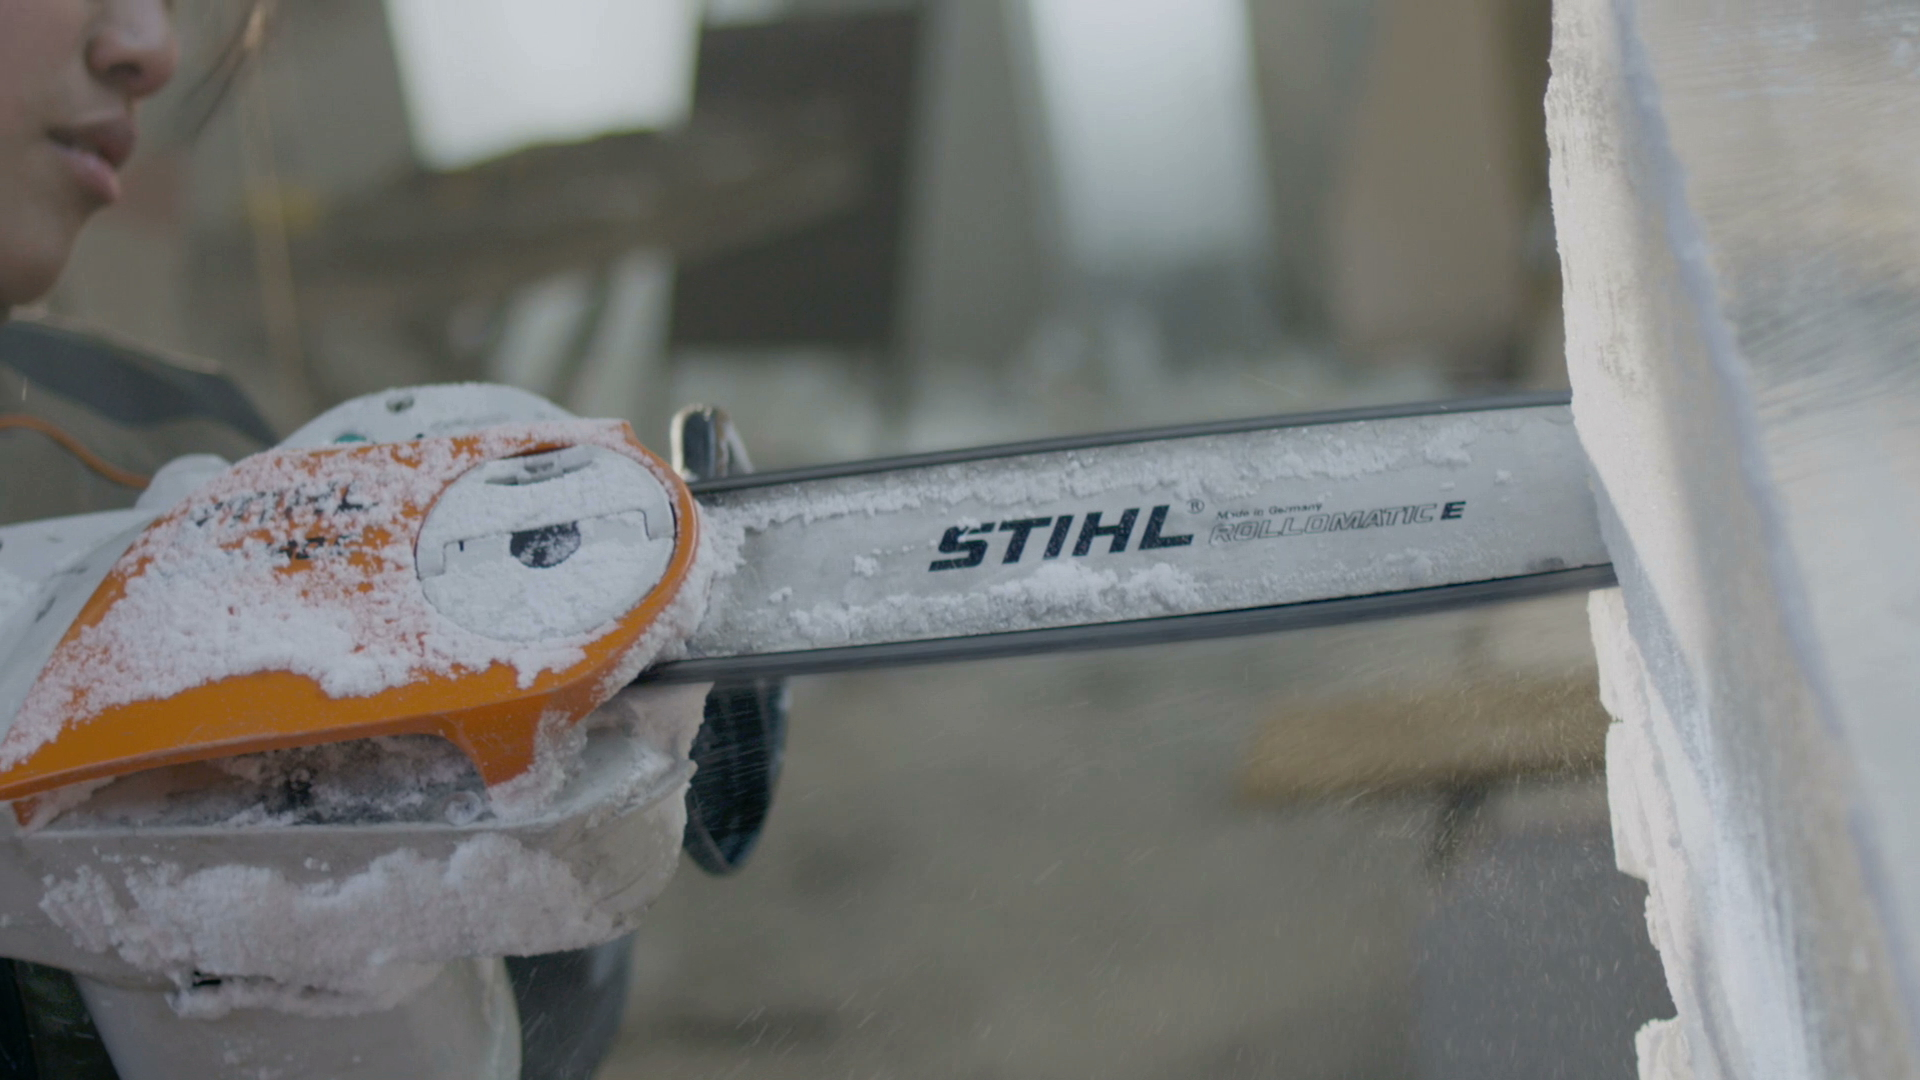 Stihl Commercial Logo